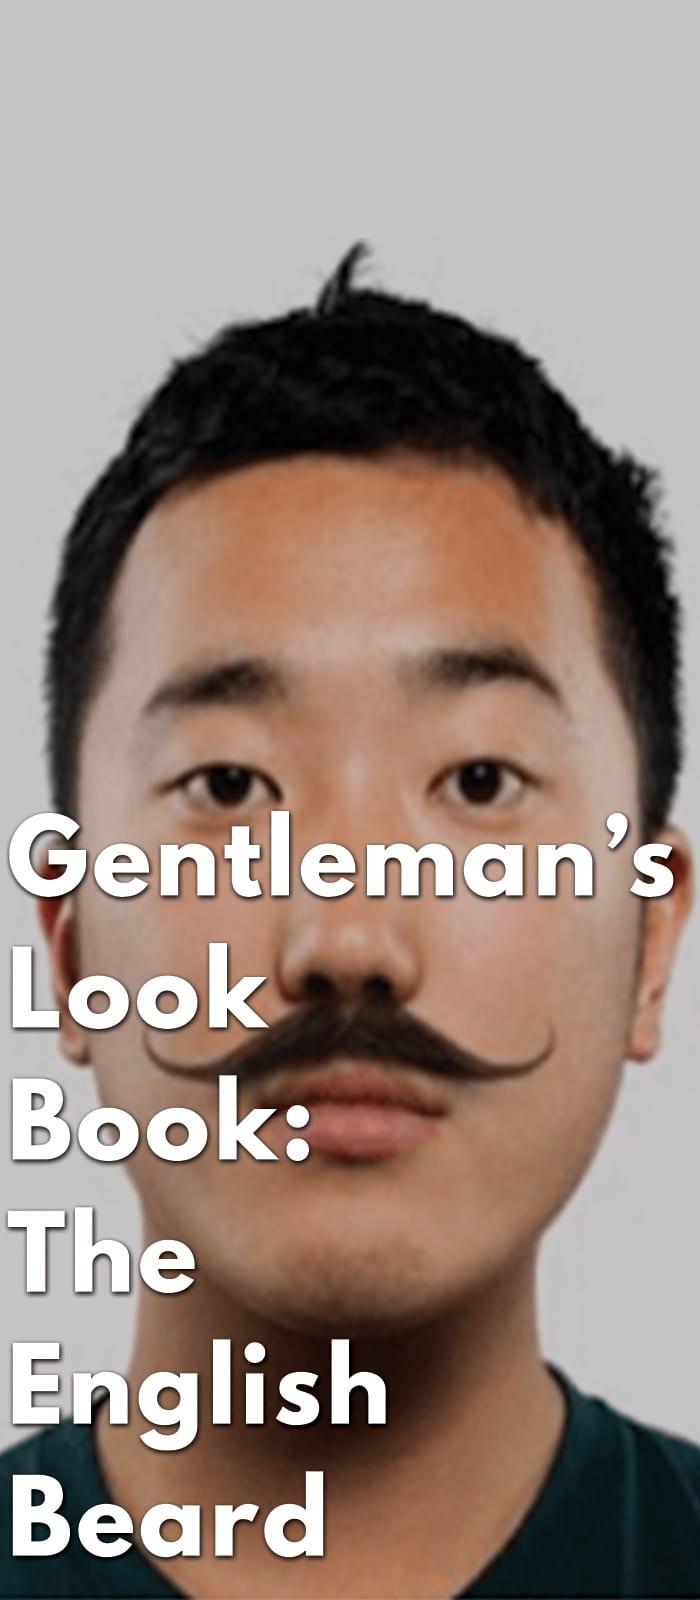 Gentleman's-Look-Book-The-English-Beard